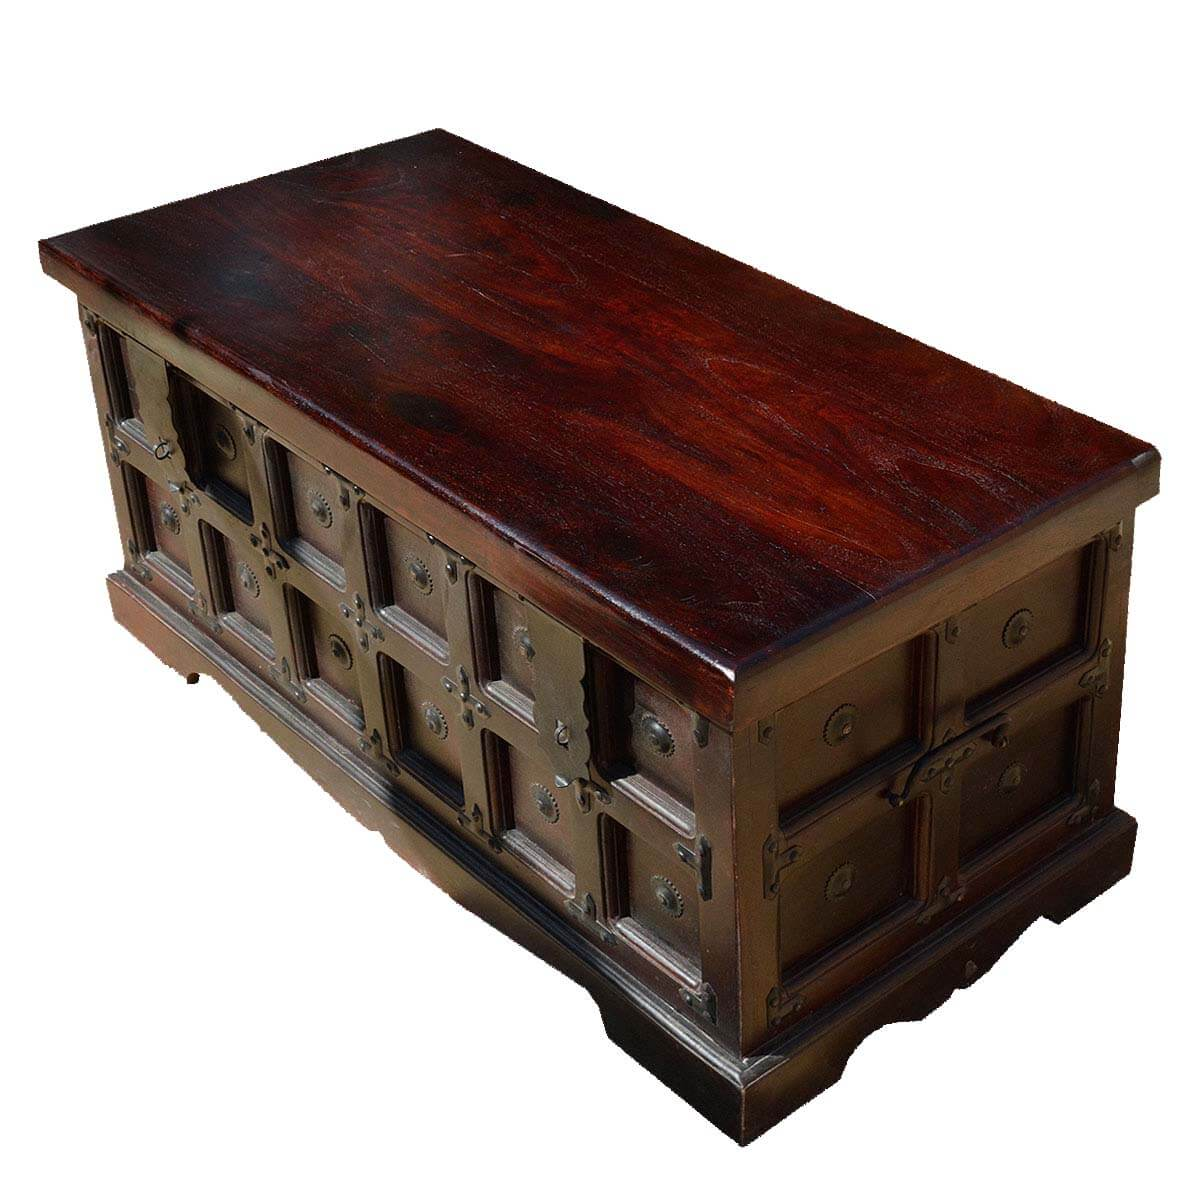 Beaufort kokanee gothic solid wood standing coffee table chest beaufort kokanee gothic indian rosewood standing coffee table chest geotapseo Choice Image